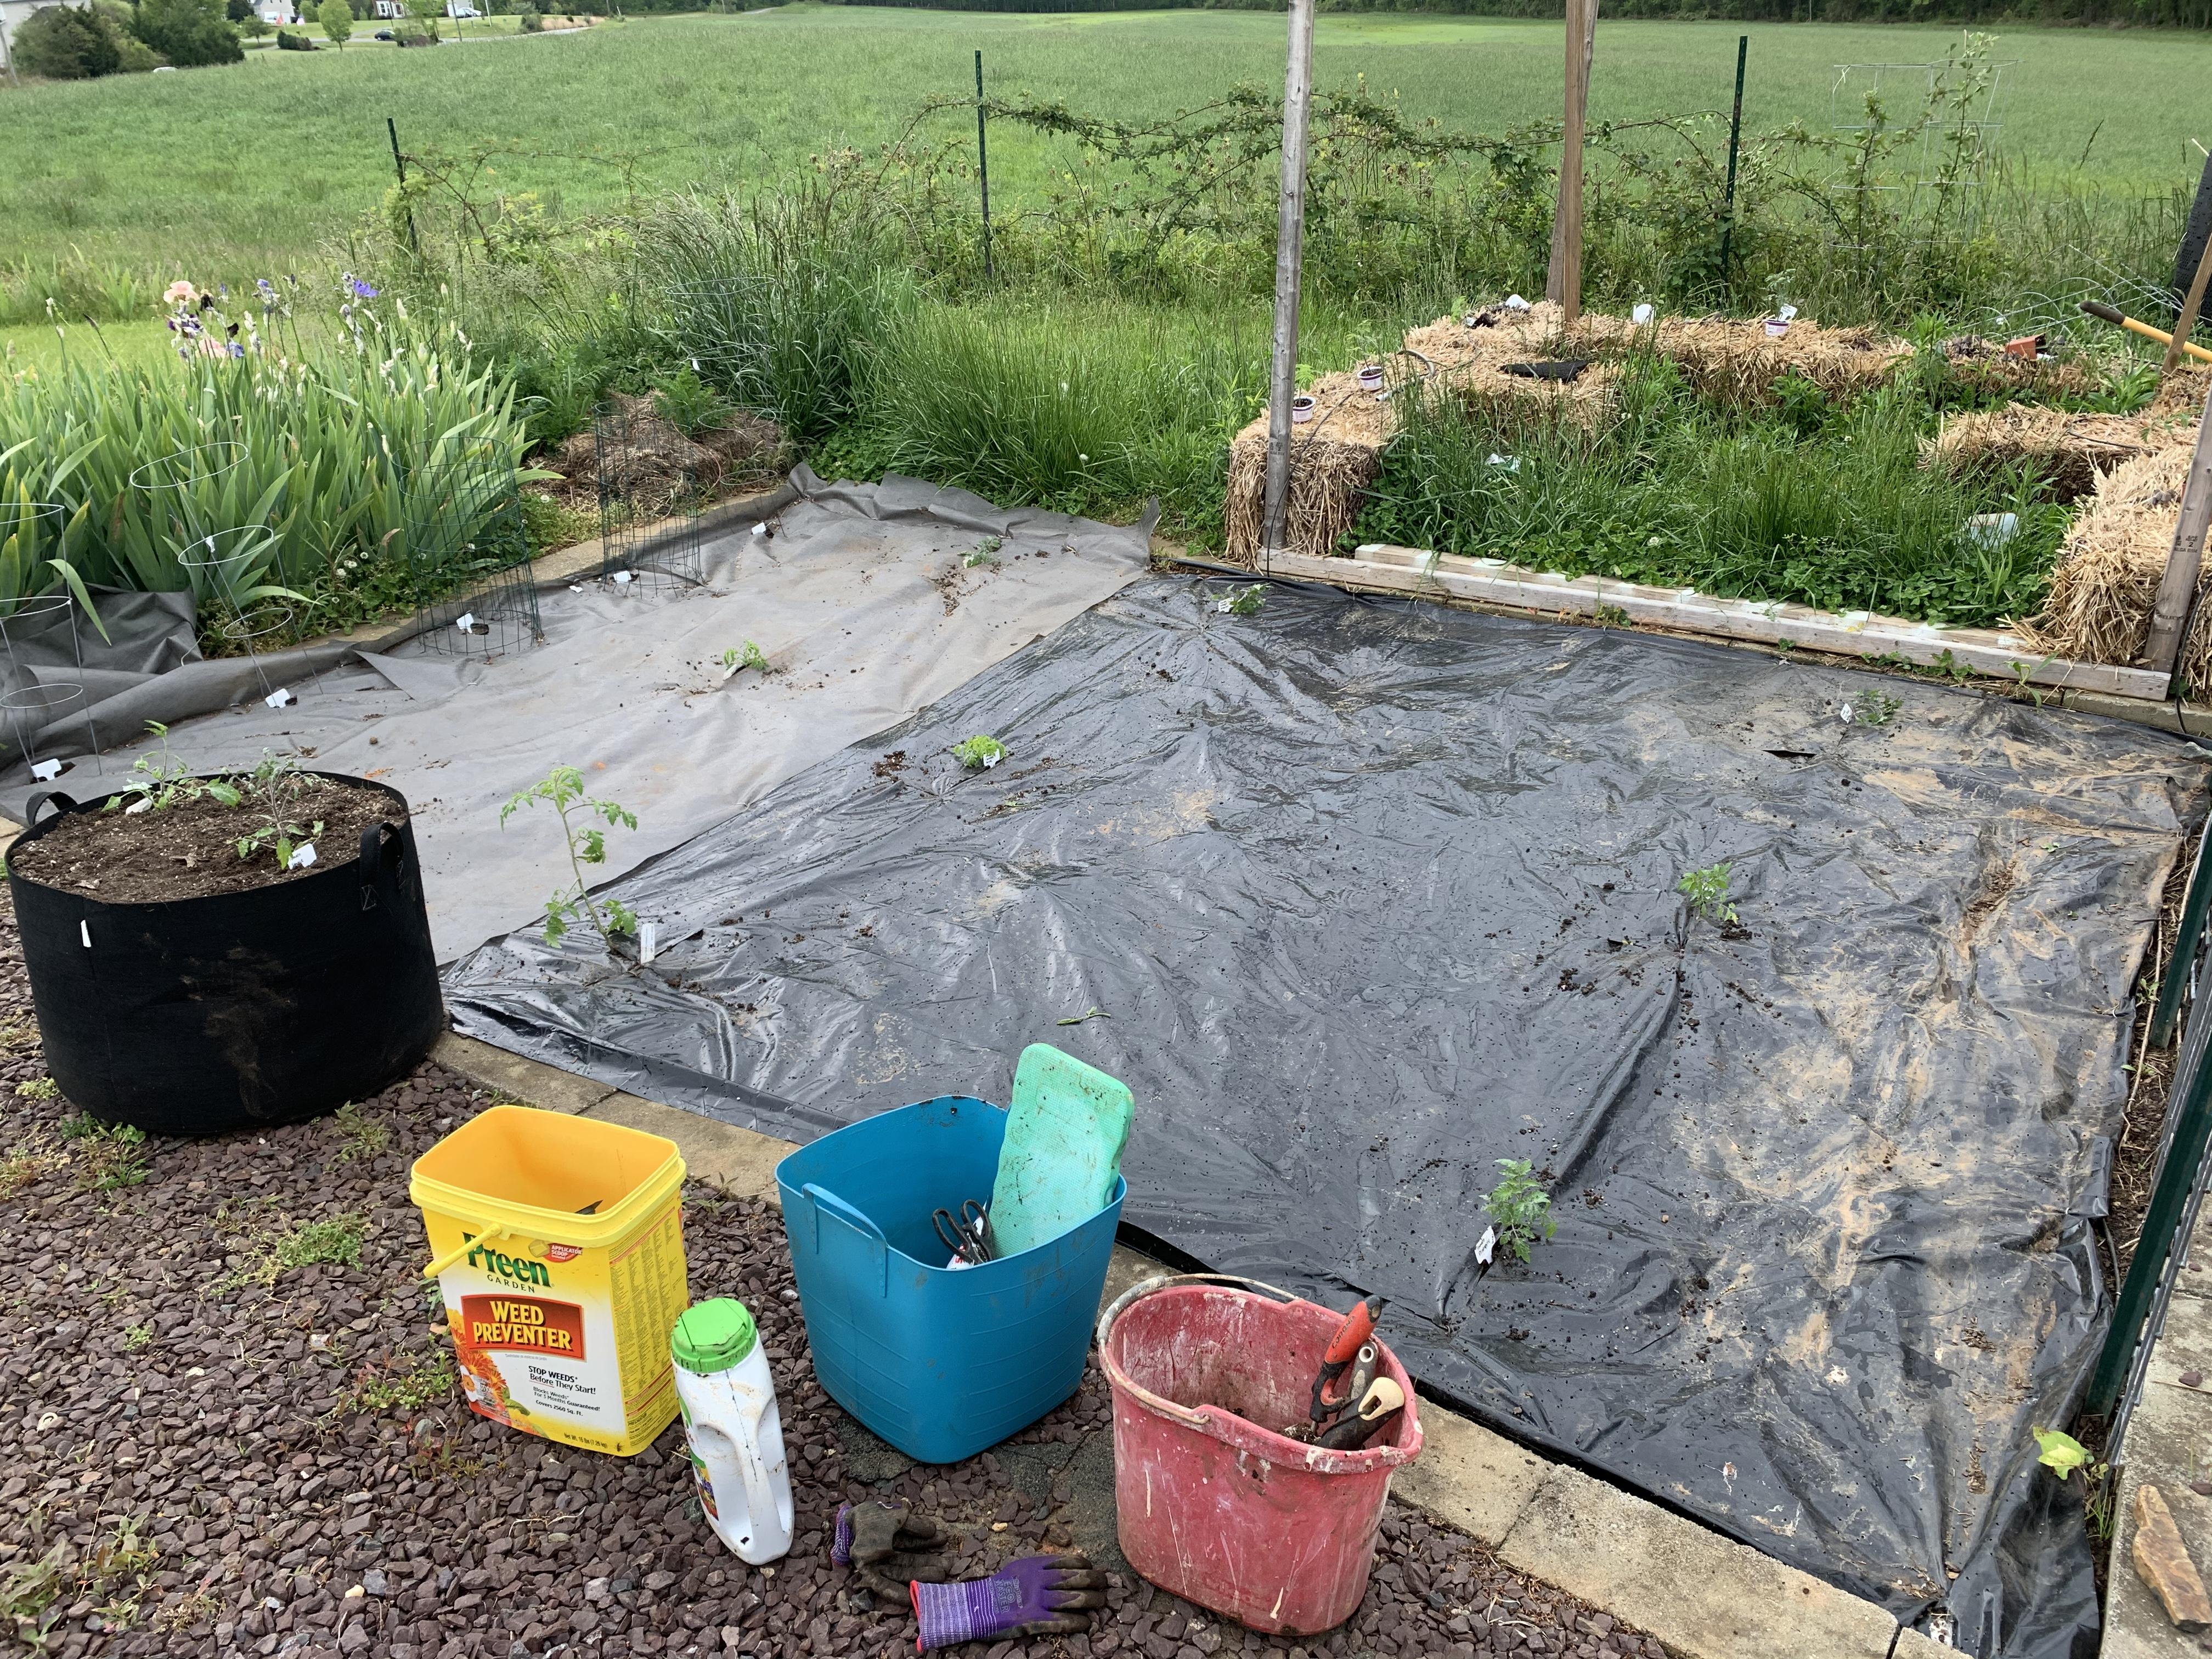 3652E315 FBB5 48DC 9C58 2926D4D06BC3 Tomato planting day!